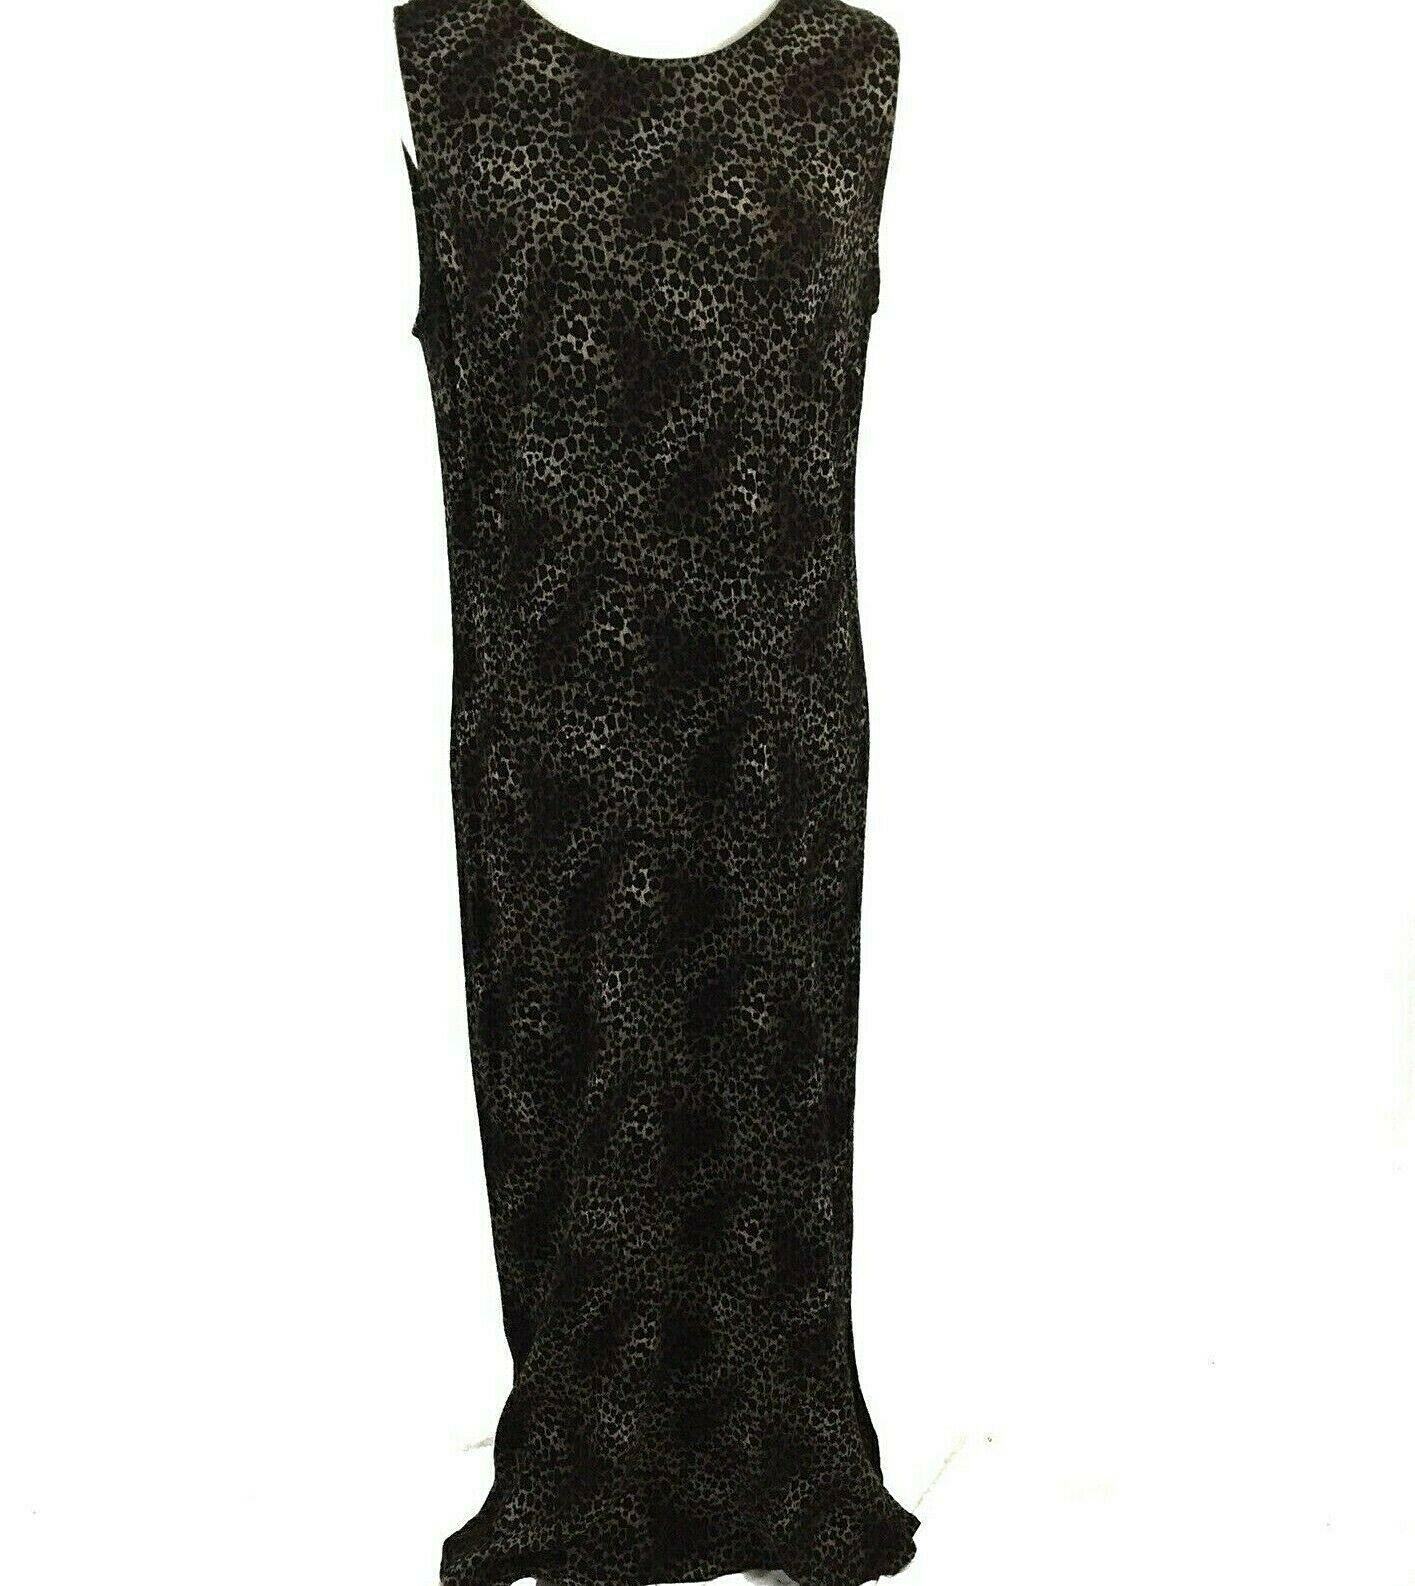 KSL Karin Stevens Sleeveless Maxi Dress and Jacket Size 14W Brown Animal Print image 7